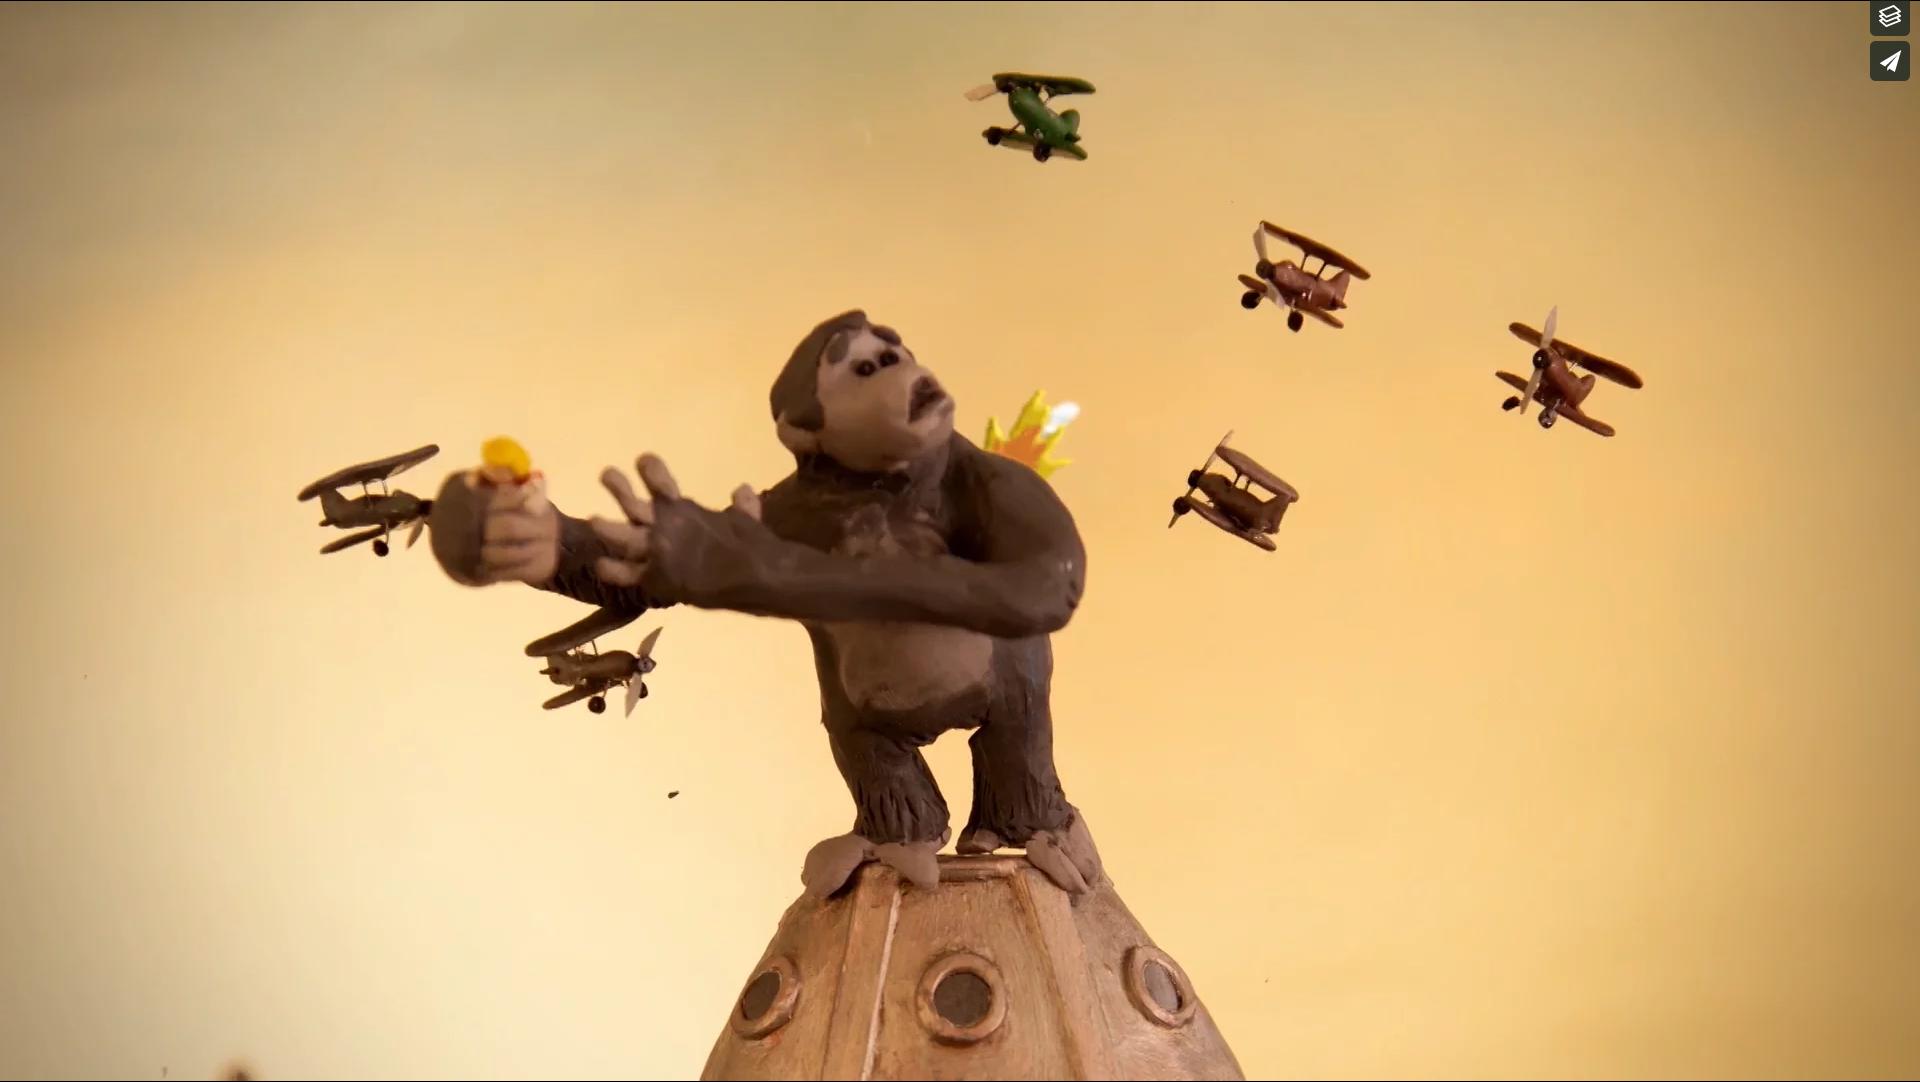 King Kong battles, in Princess Kong a film for Plan International